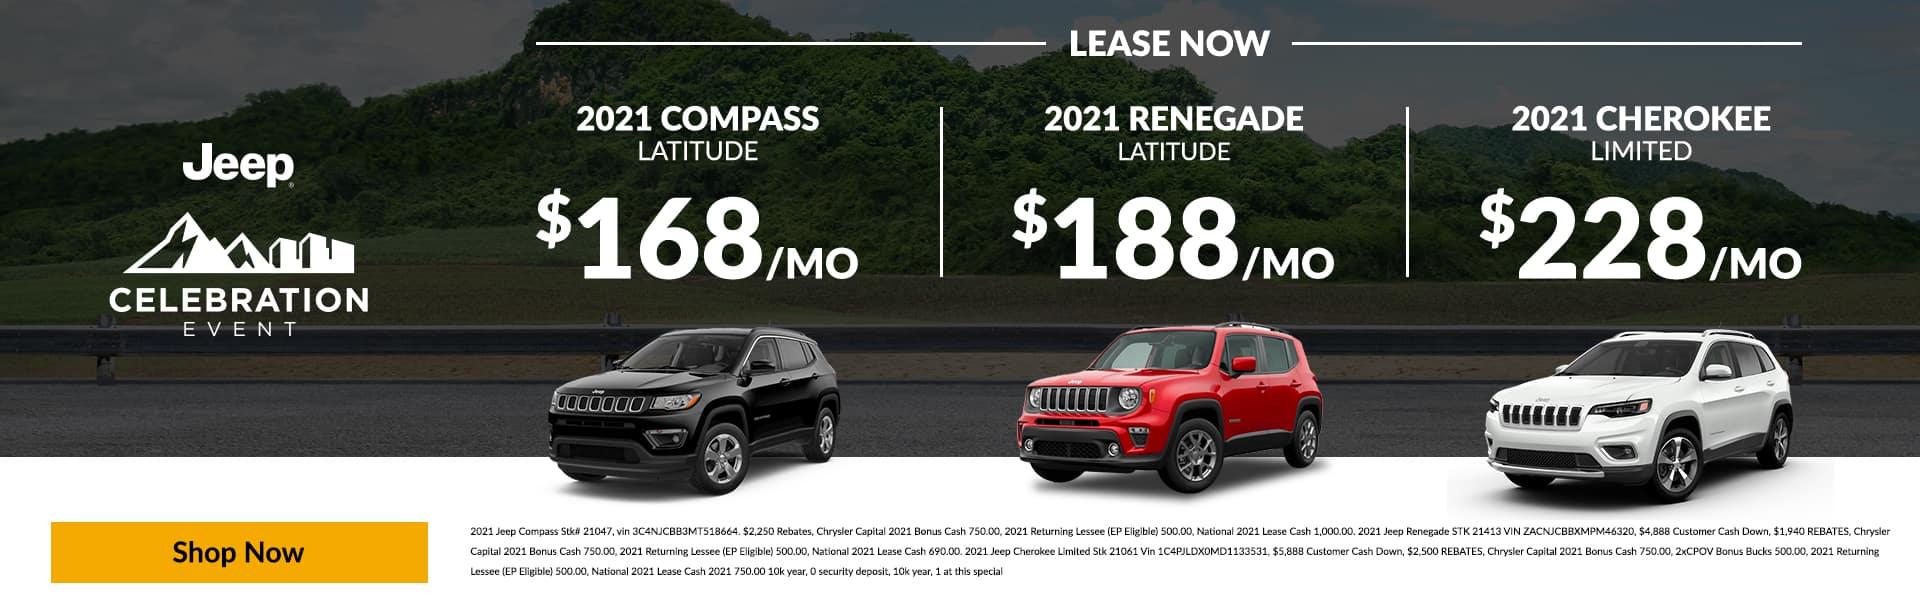 2021 Compass Latitude, 2021 Renegade Latitude - 2021 Cherokee Limited LEASE NOW $168 | $188 | $228